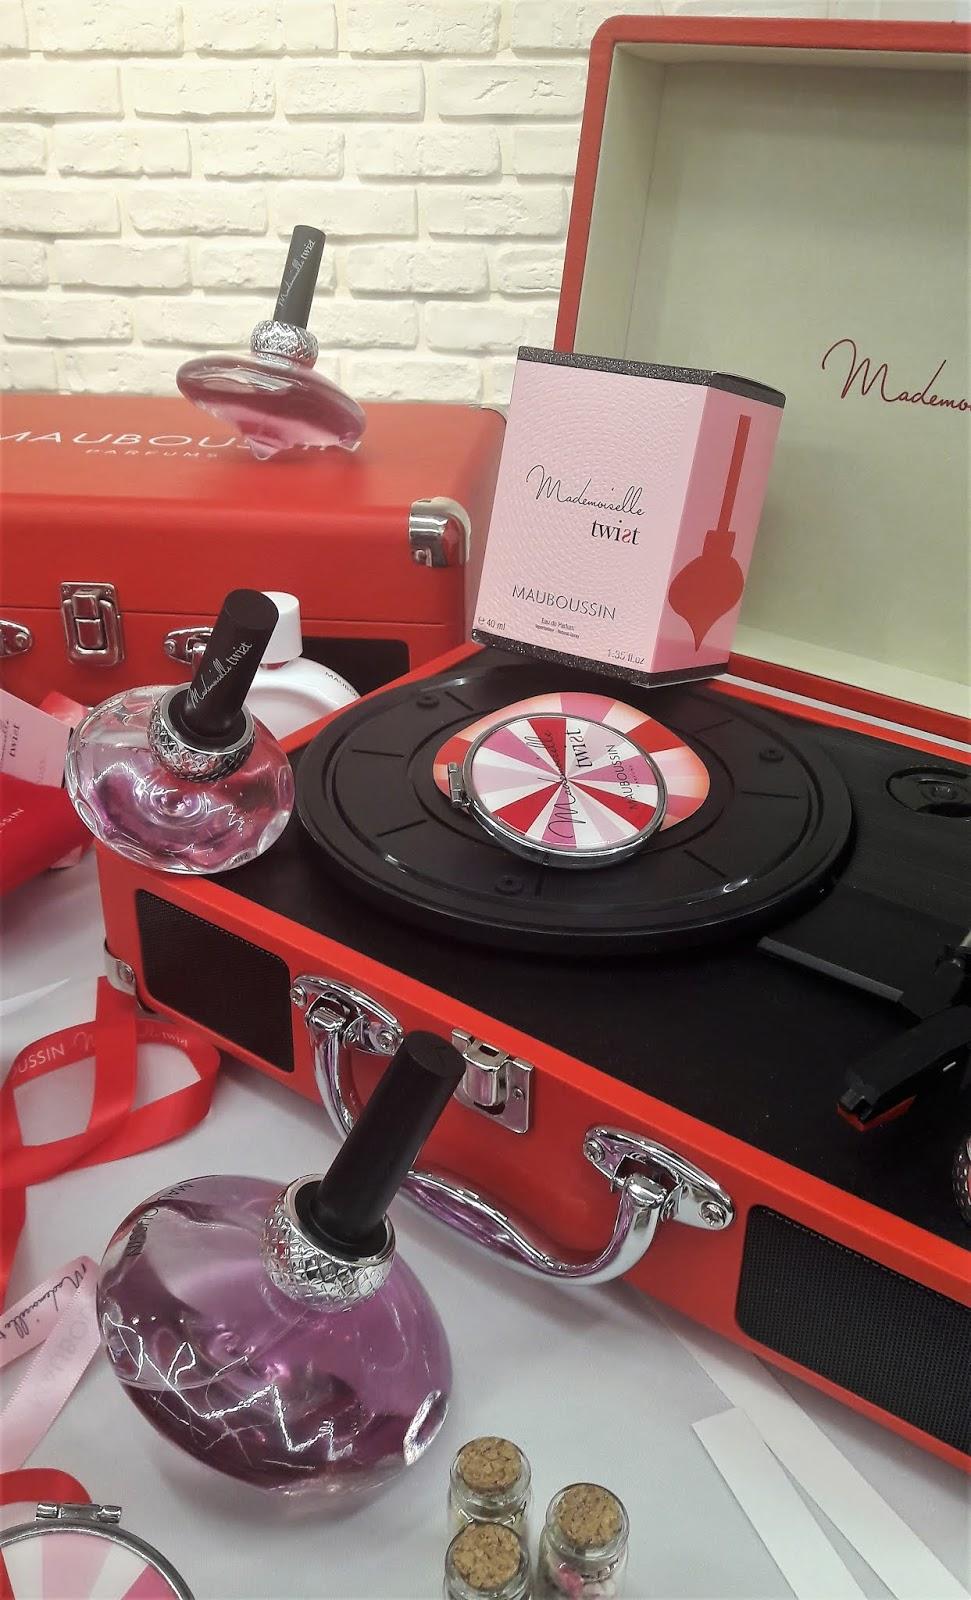 Mademoiselle Présente Parfums Skarlette BeautéMauboussin TwistDame g76Yyfb